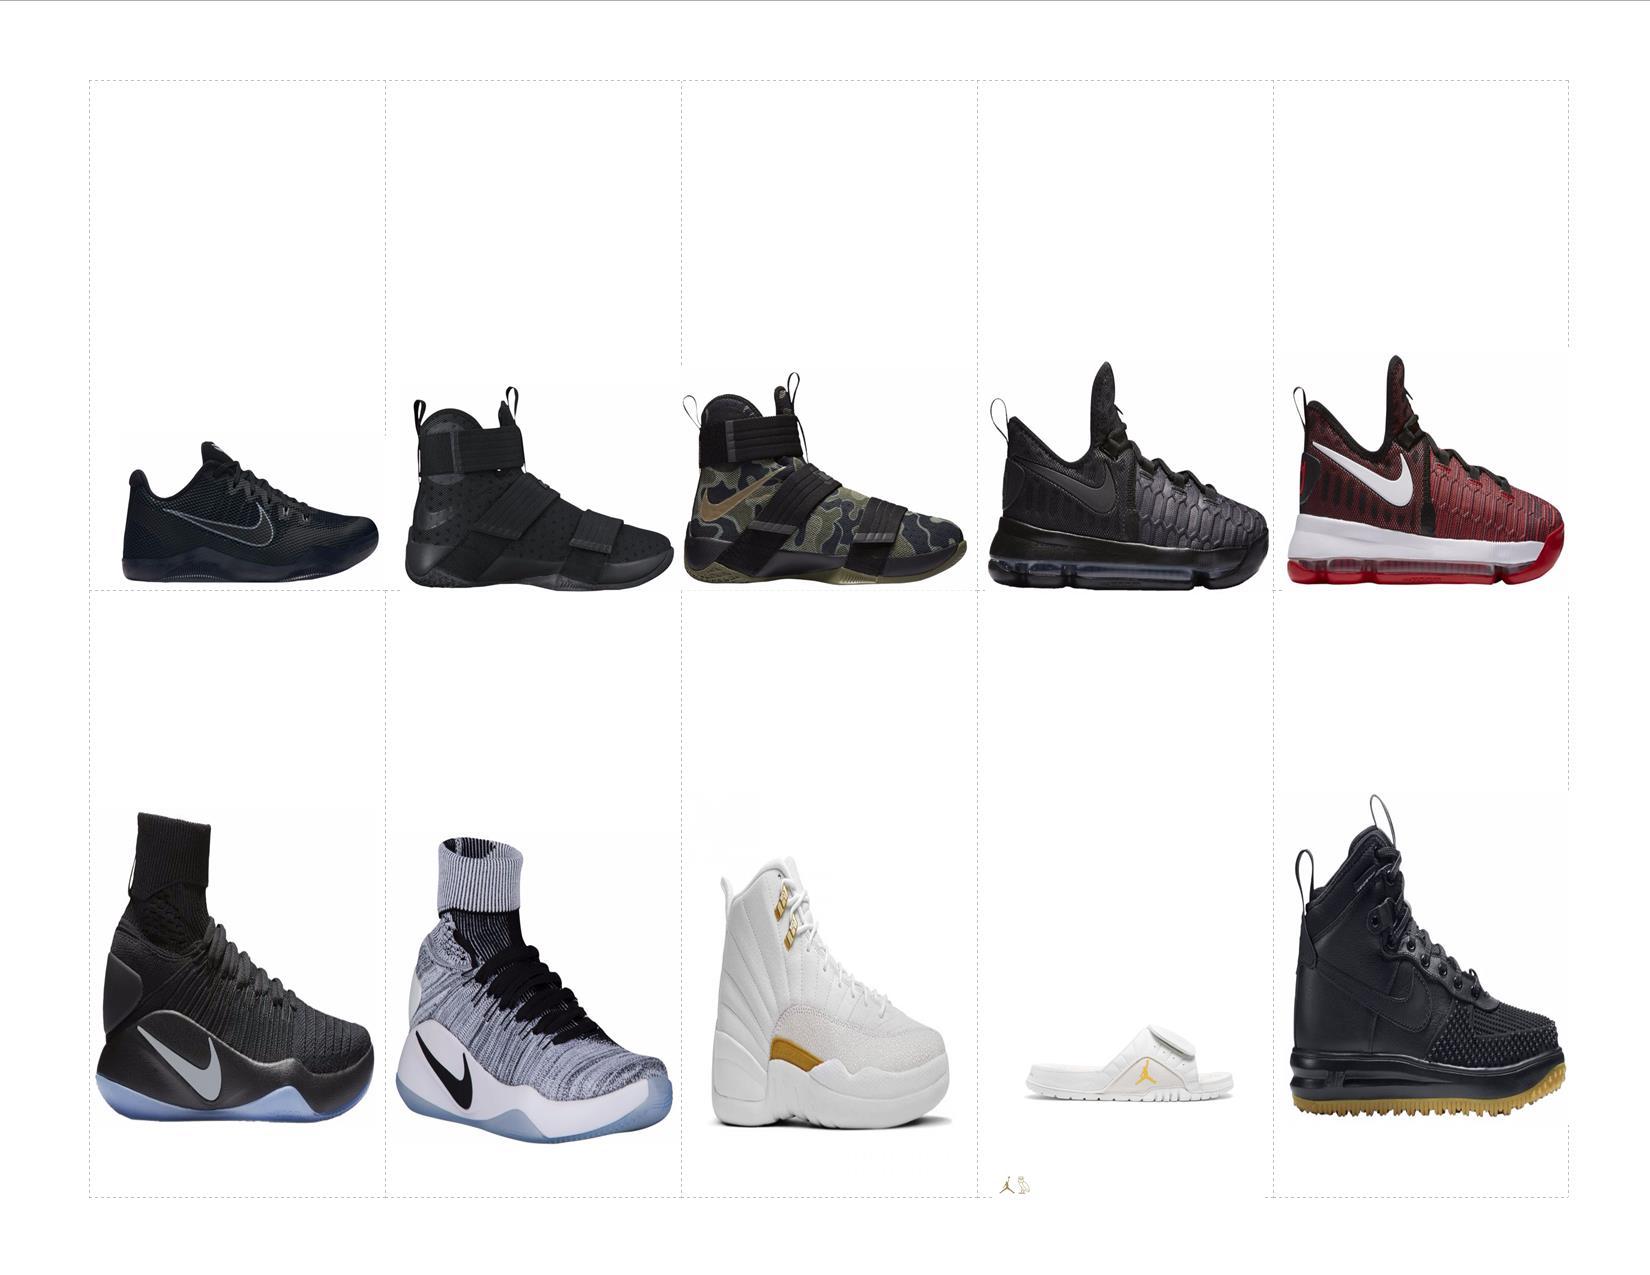 f986932b9b1211 10 Nike   Air Jordan Sneakers That Dropped This Week end – Housakicks